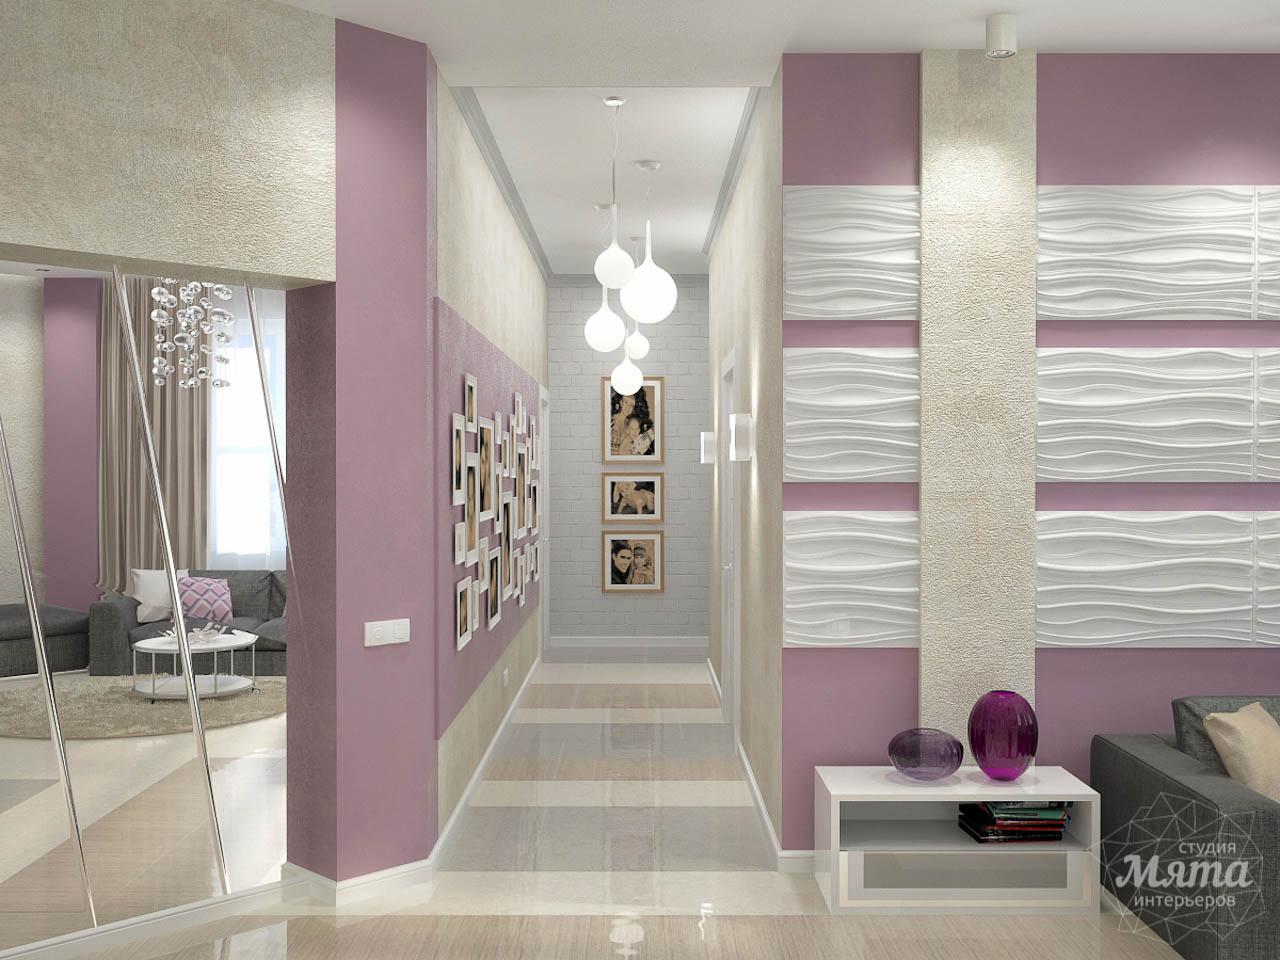 Дизайн интерьера и ремонт трехкомнатной квартиры по ул. Чкалова 124 img1642398660